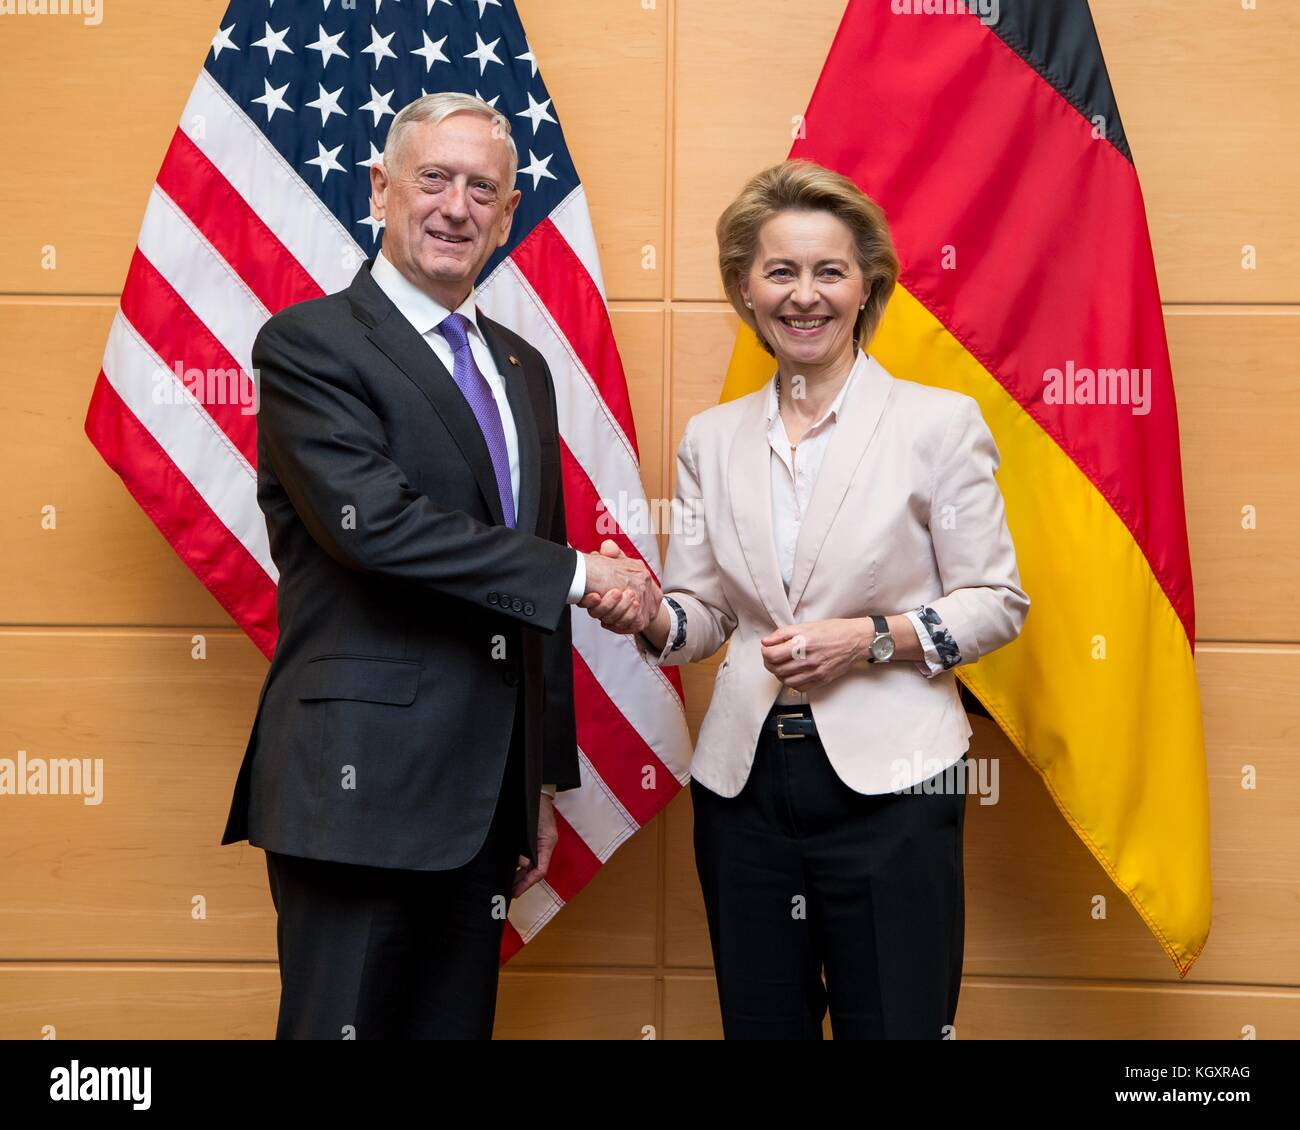 U.S. Defense Minister James Mattis (left) meets with German Defense Minister Ursula von der Leyen at the NATO Headquarters - Stock Image